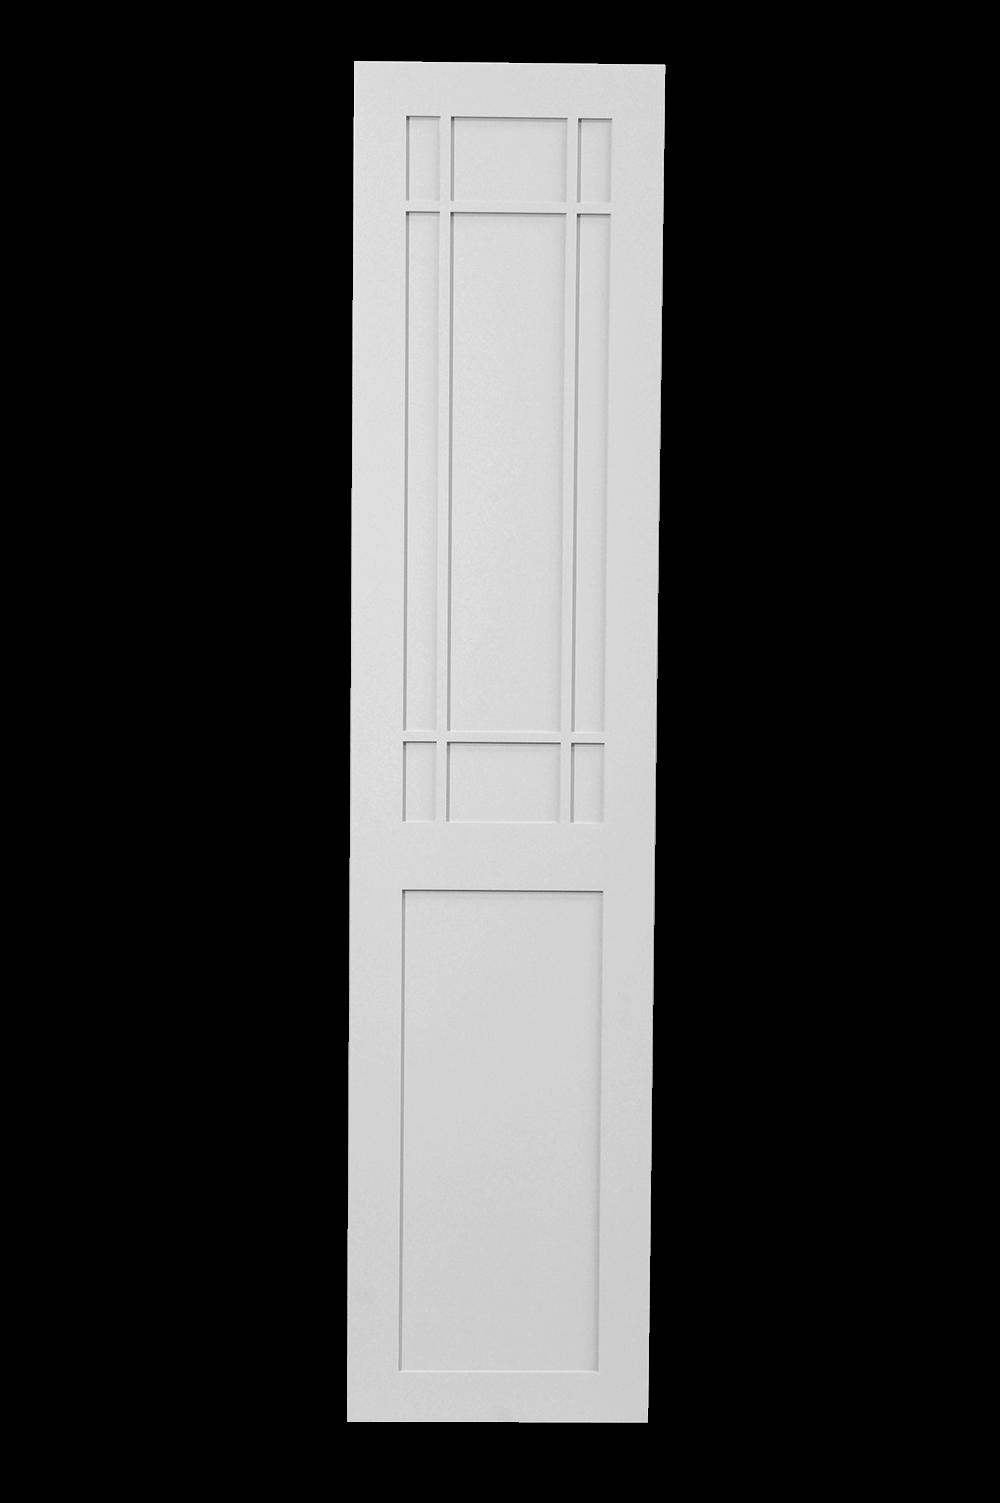 Macintosh wardrobe door